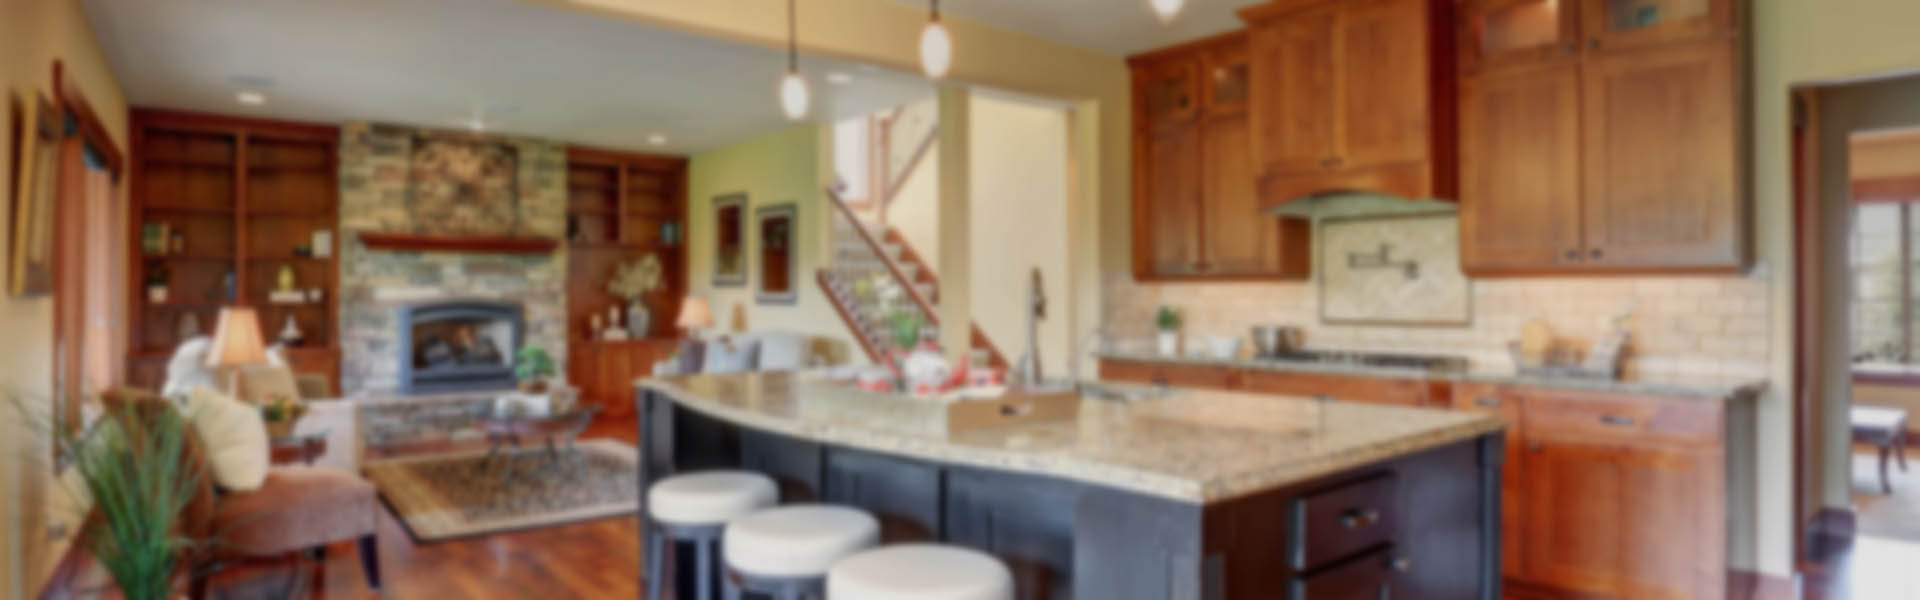 interior of home for sale in Sacramento